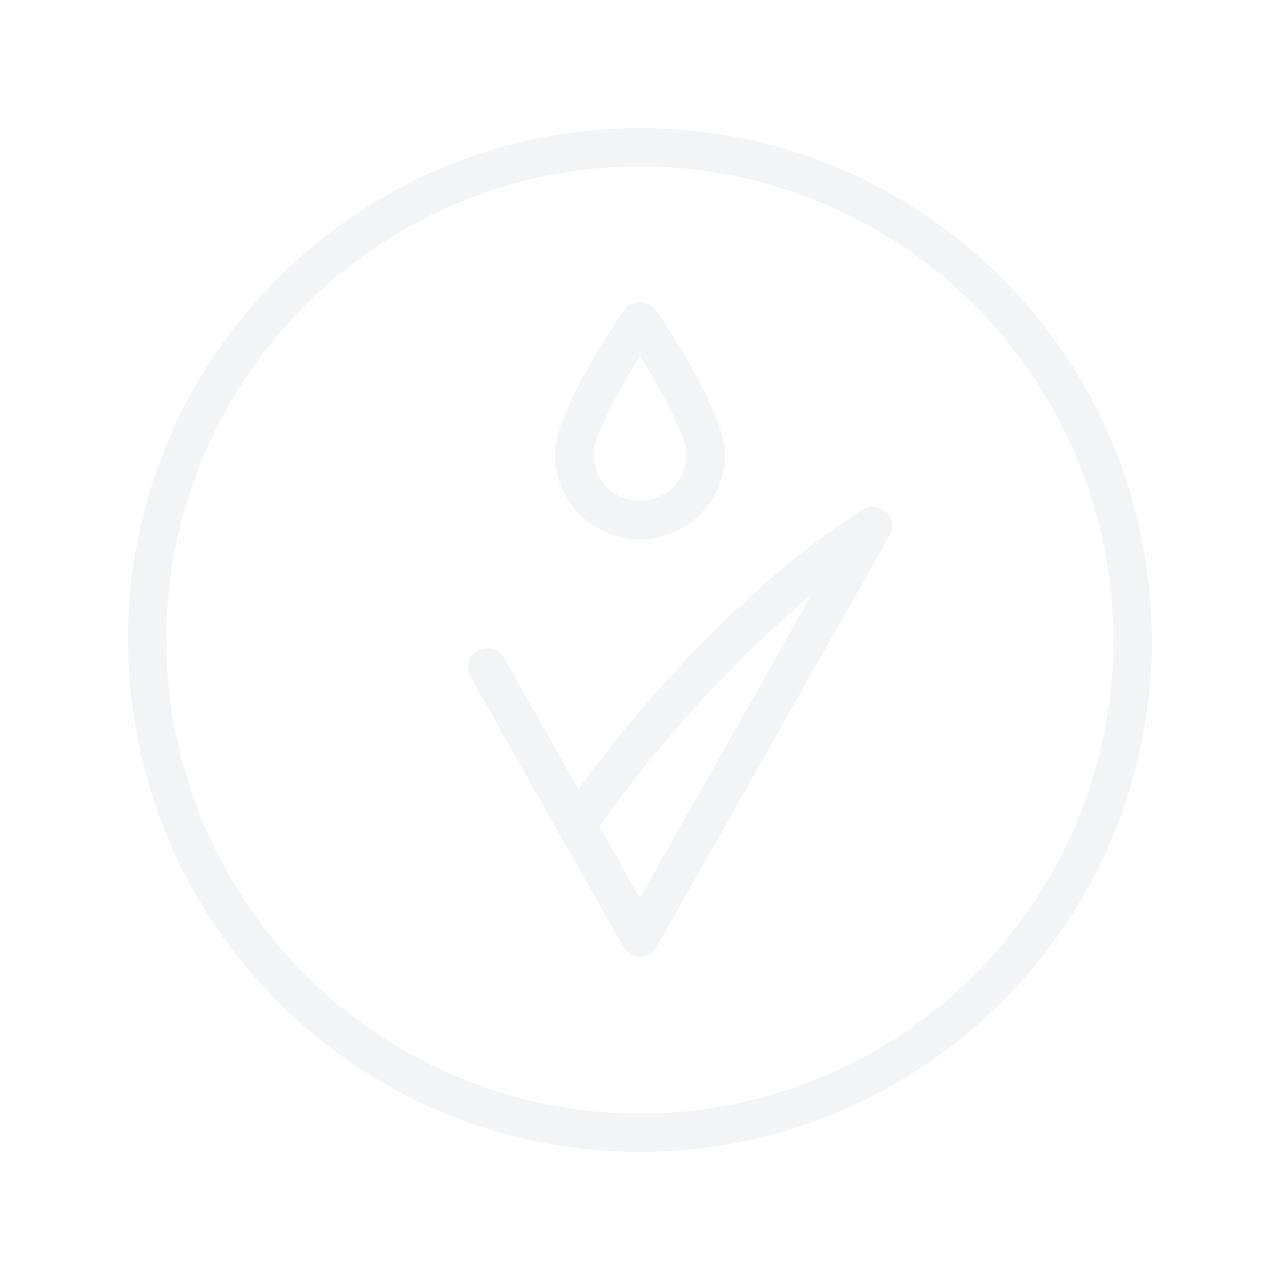 NANSHY Contouring Brush White